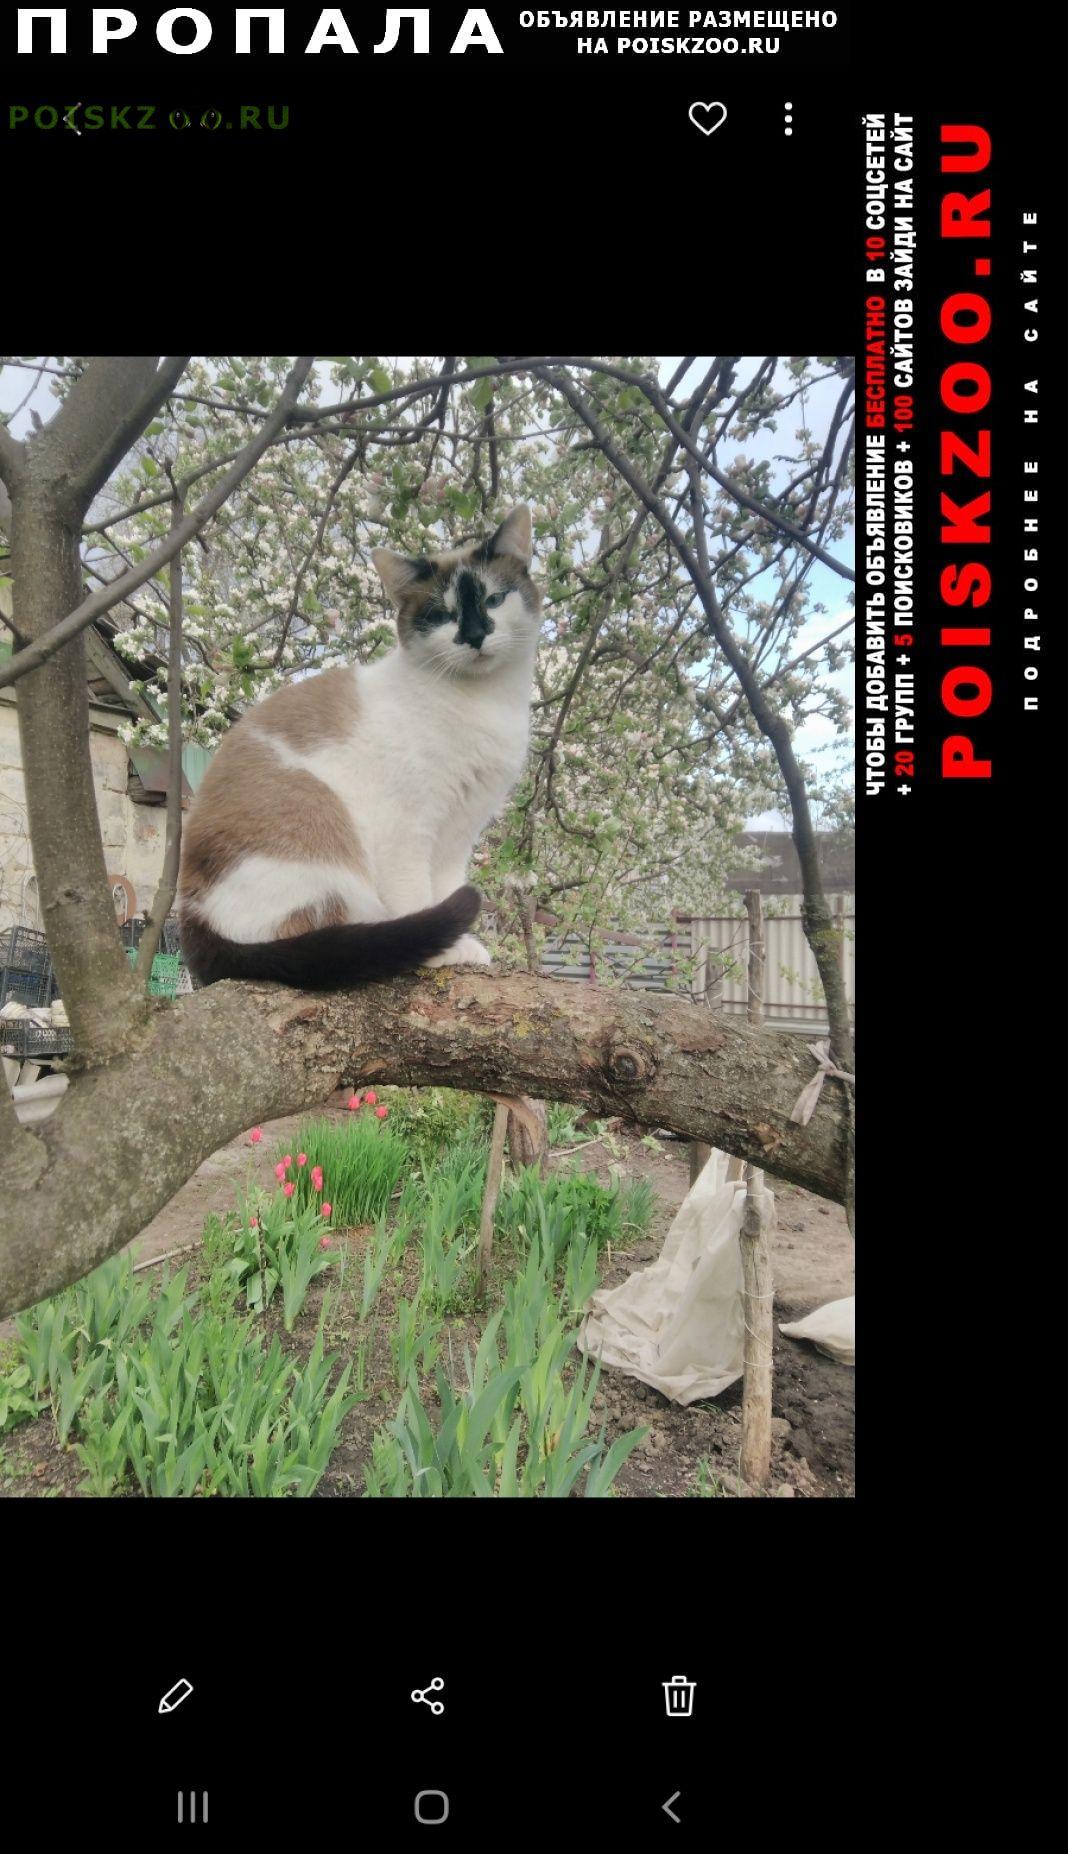 Пропала кошка домашняя г.Курск